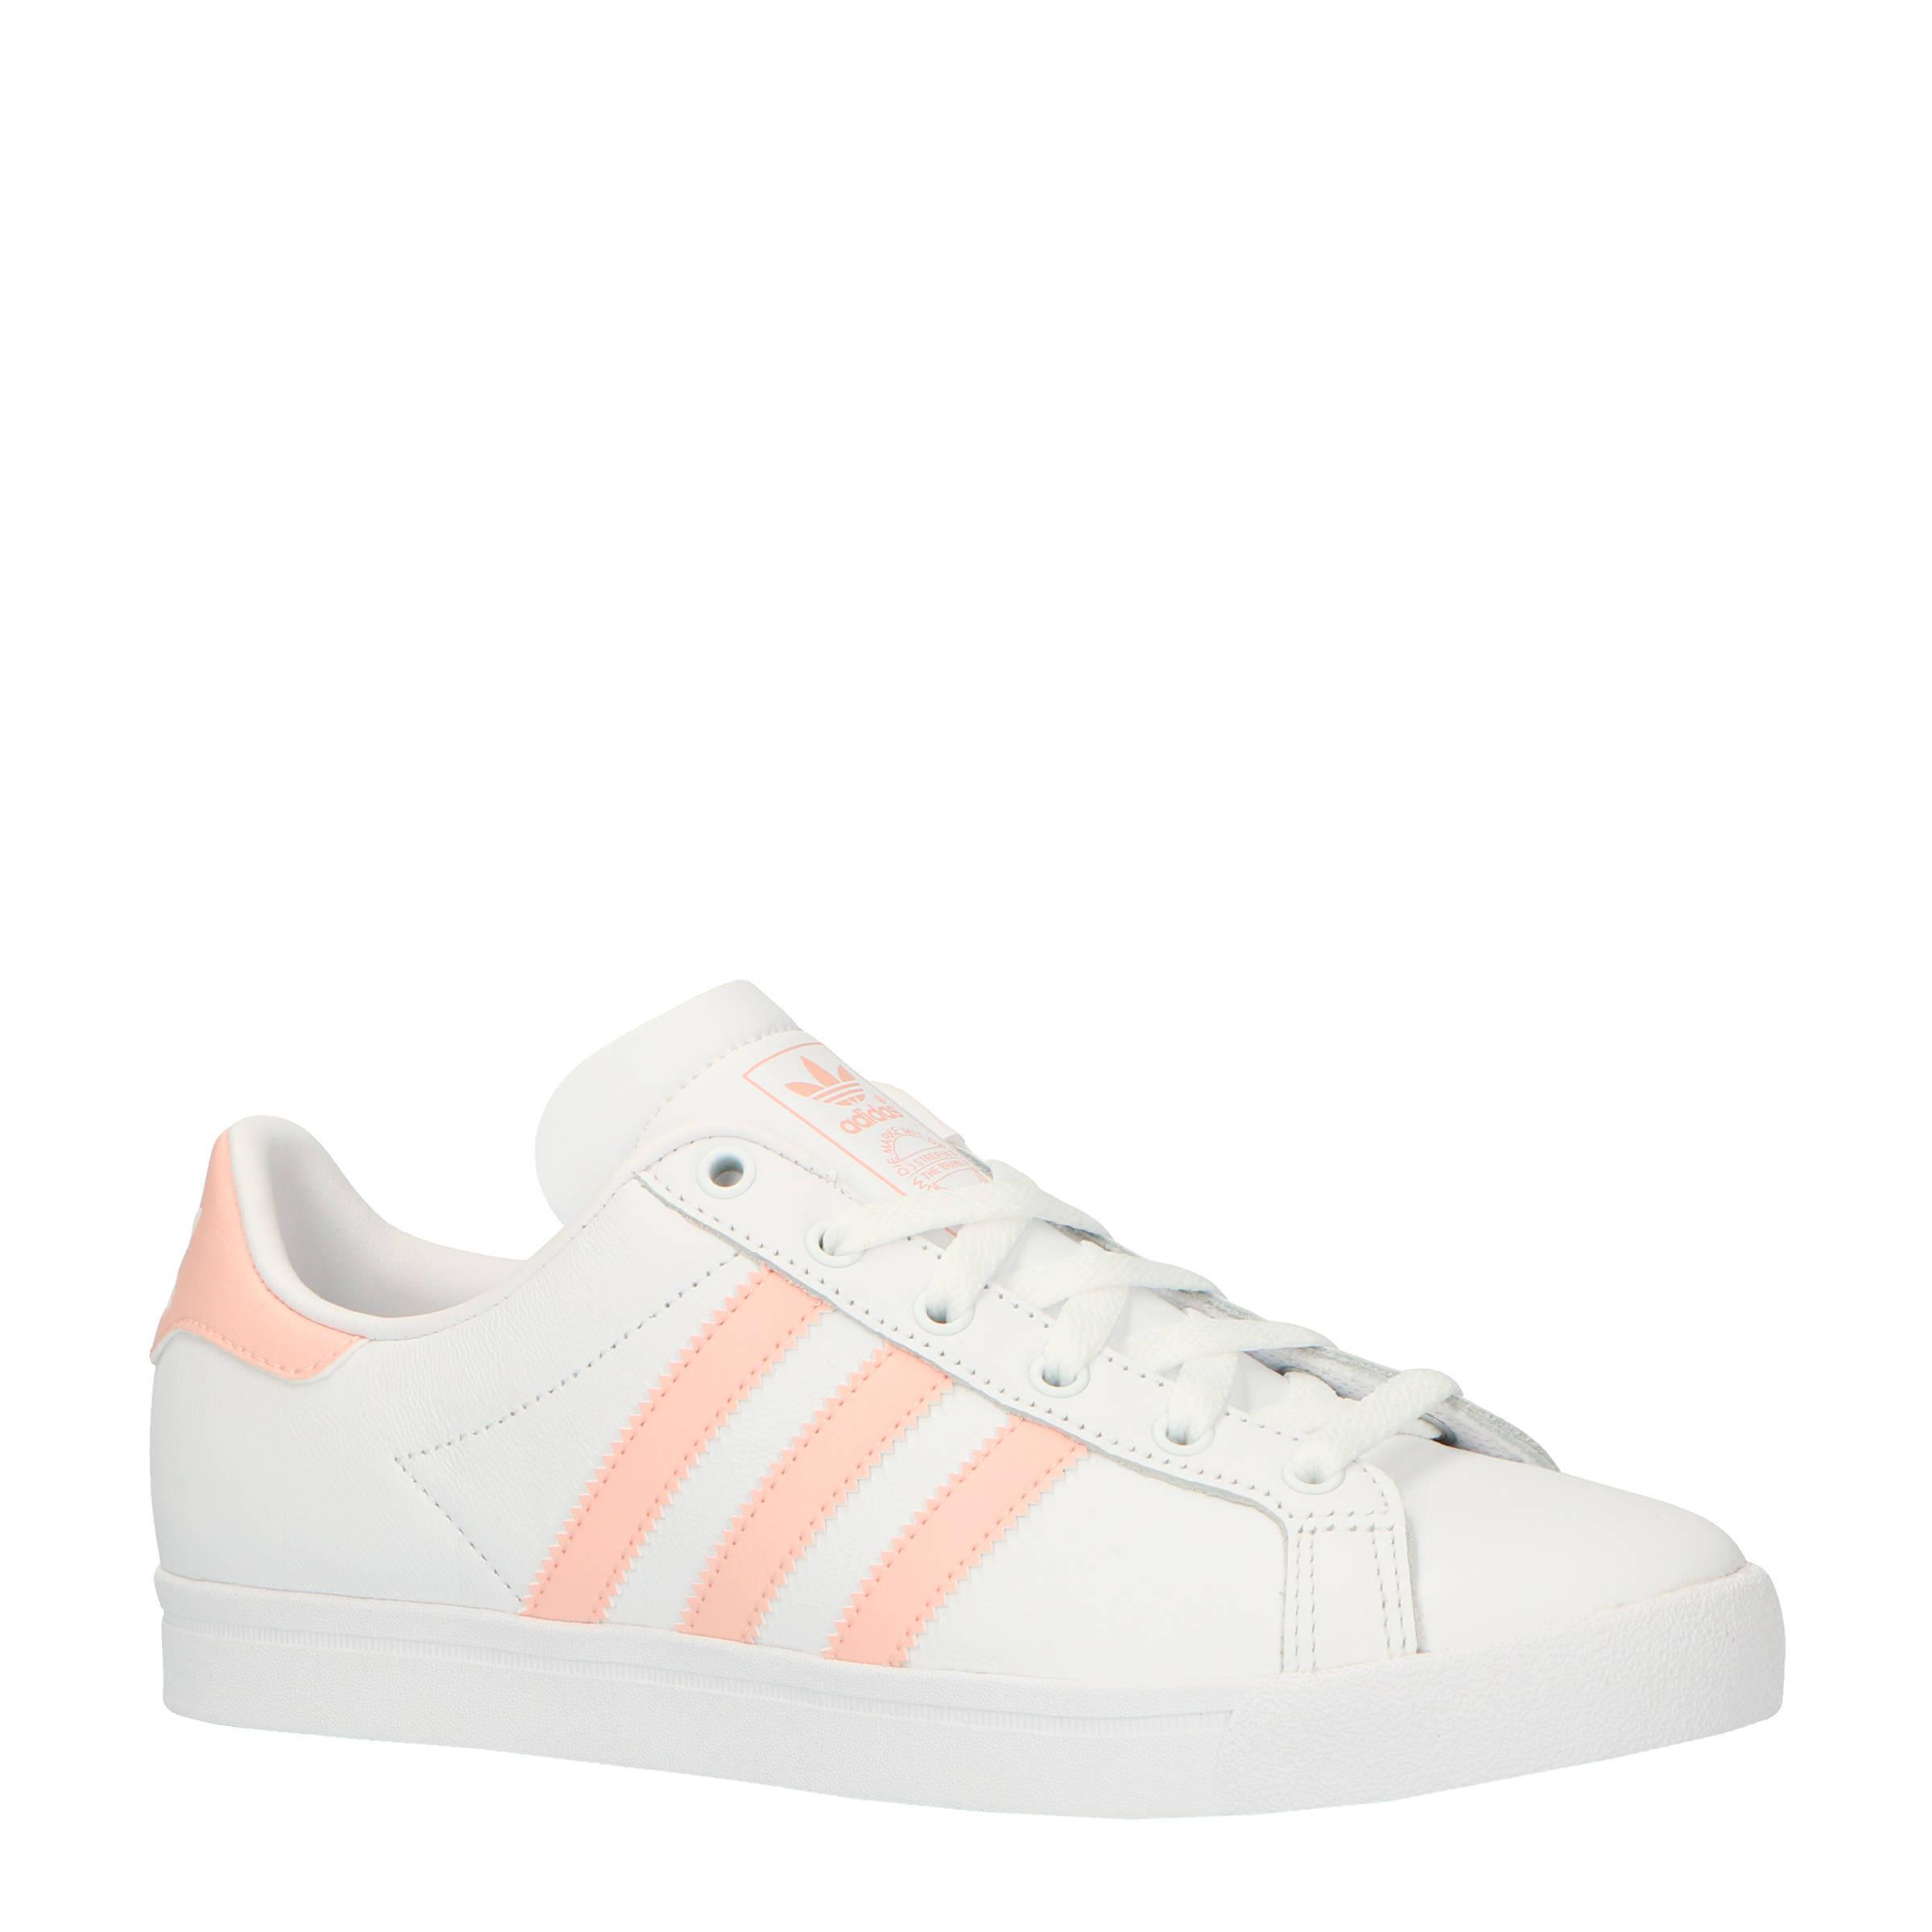 adidas originals Coast Star J sneakers wit/zalmroze | wehkamp